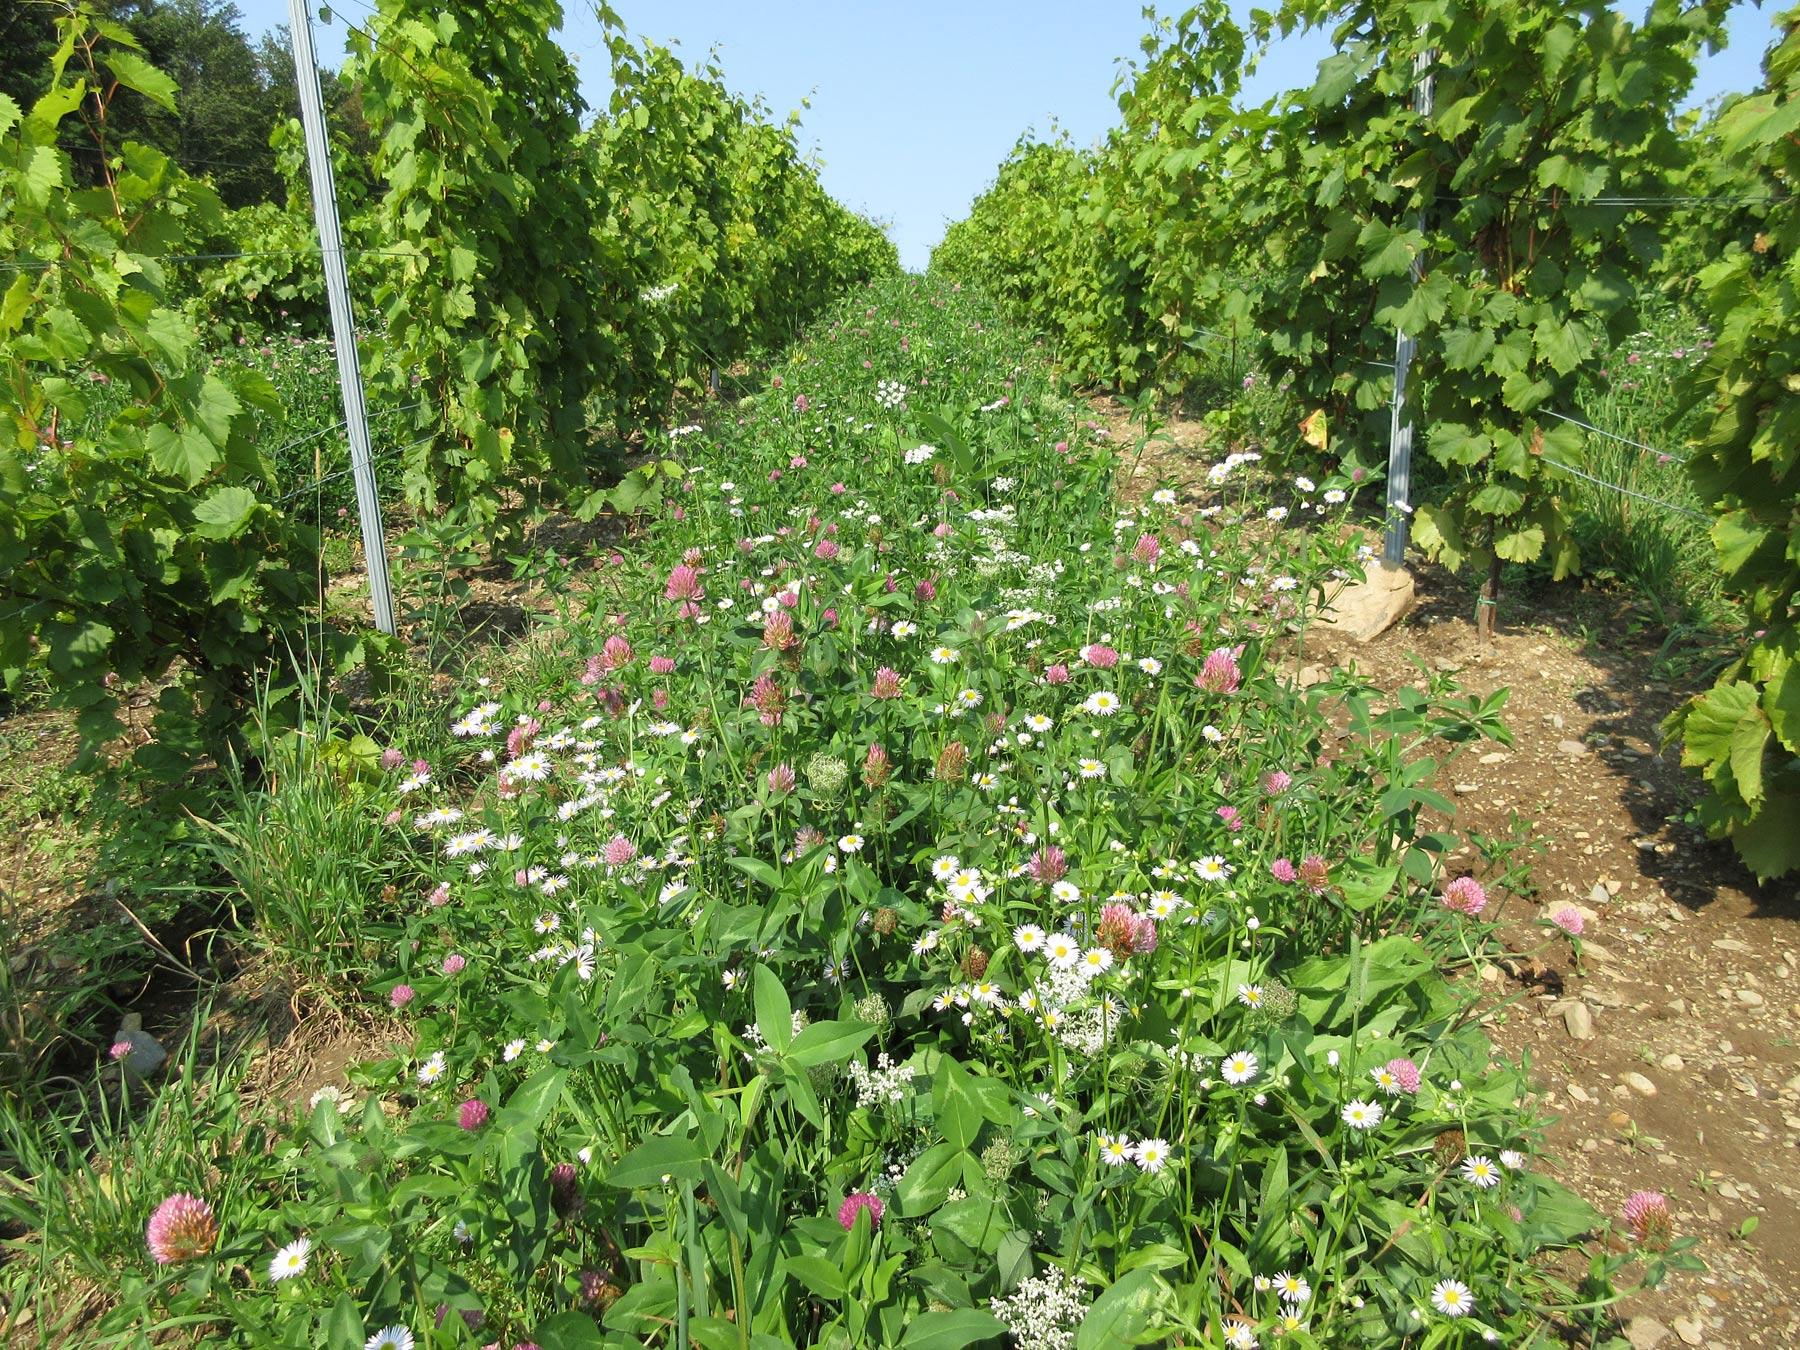 E71-Flower-cover-middle-row-in-Quebec-vineyards-(Lasnier)